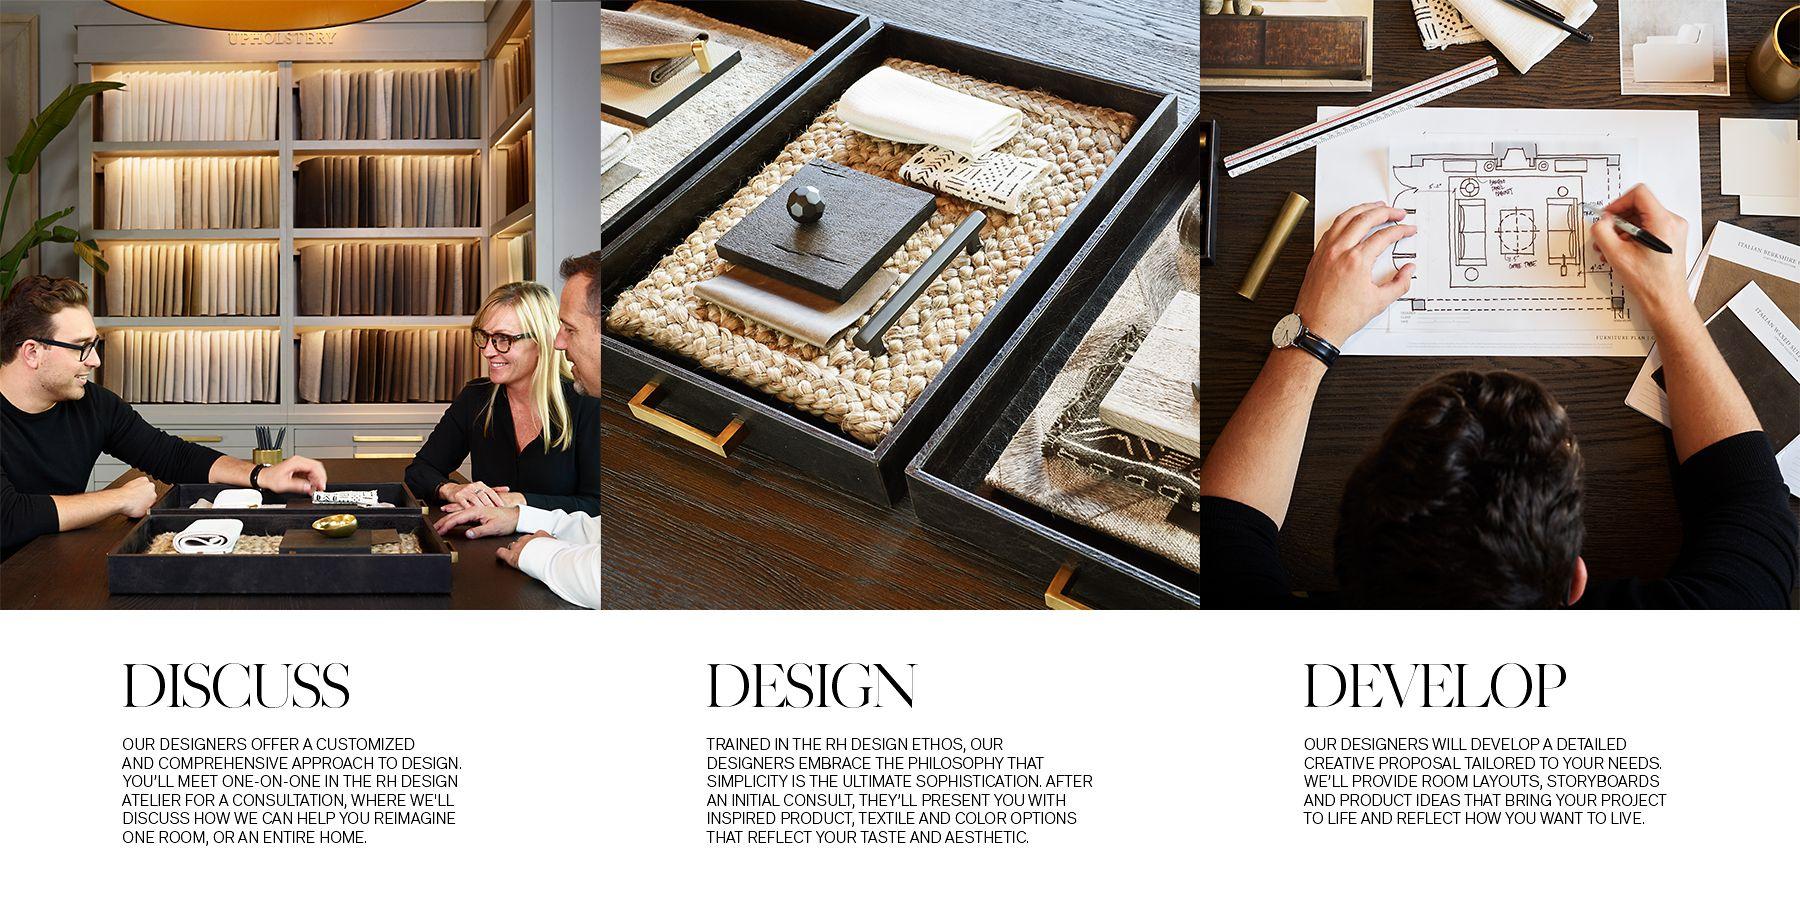 Design Atelier Rh